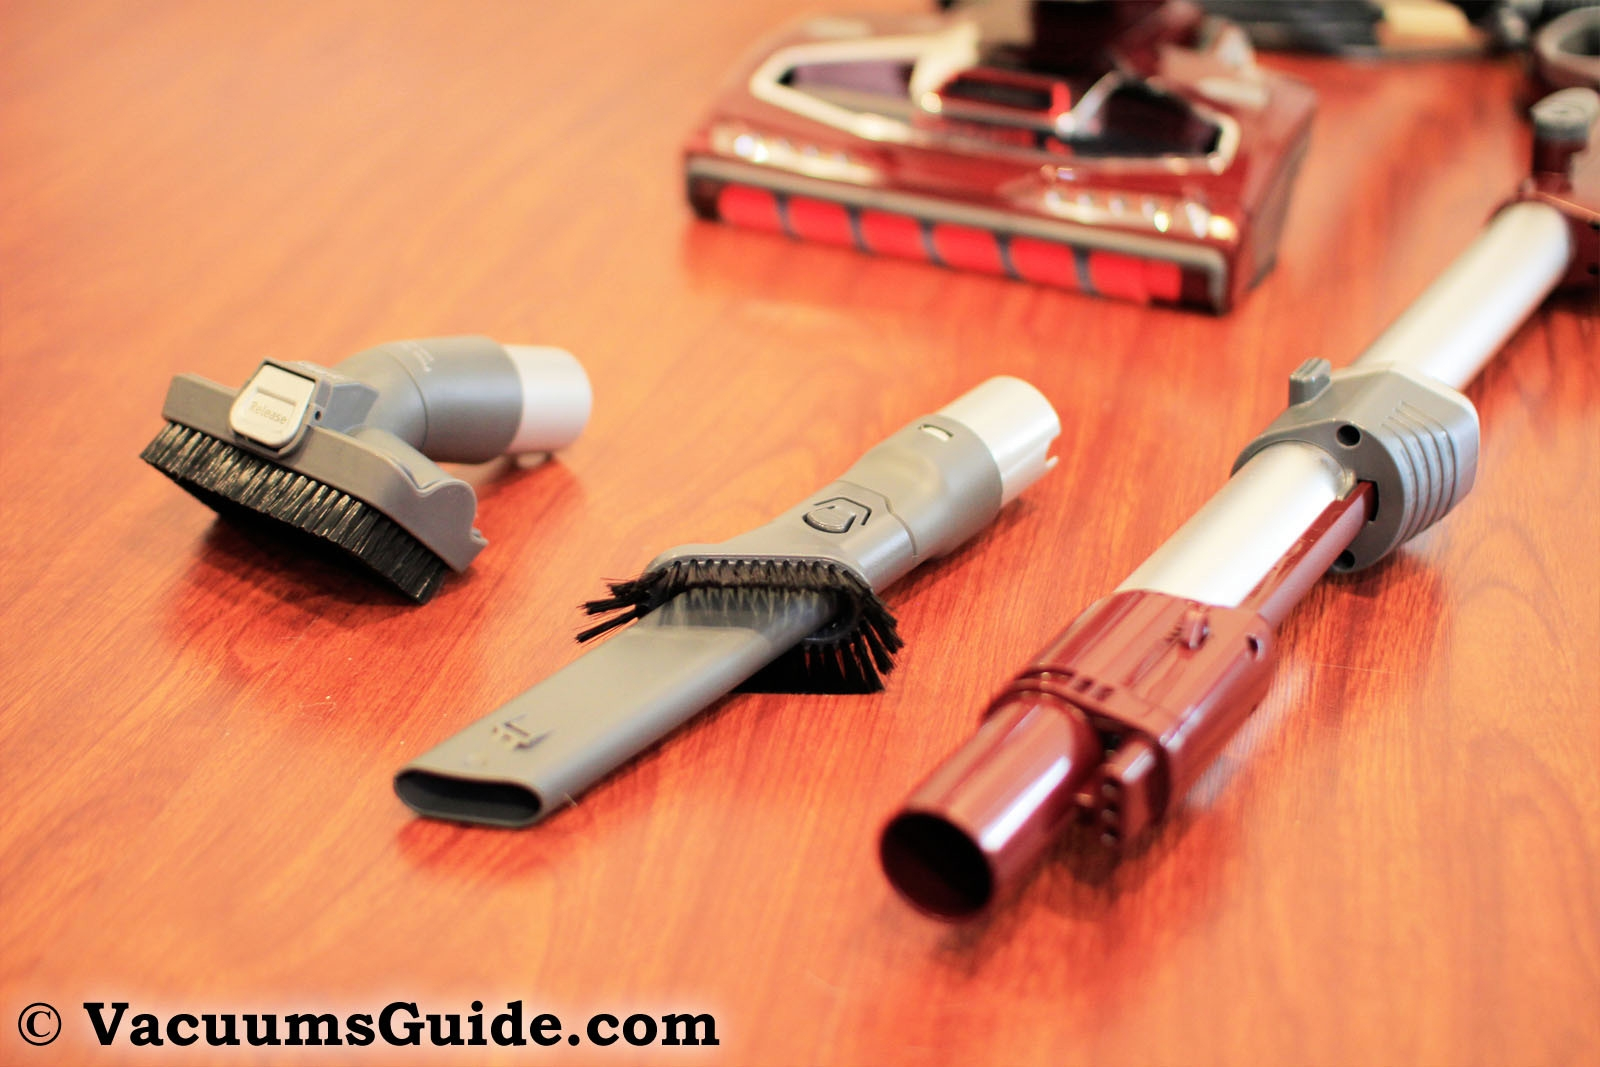 Shark DuoClean accessories